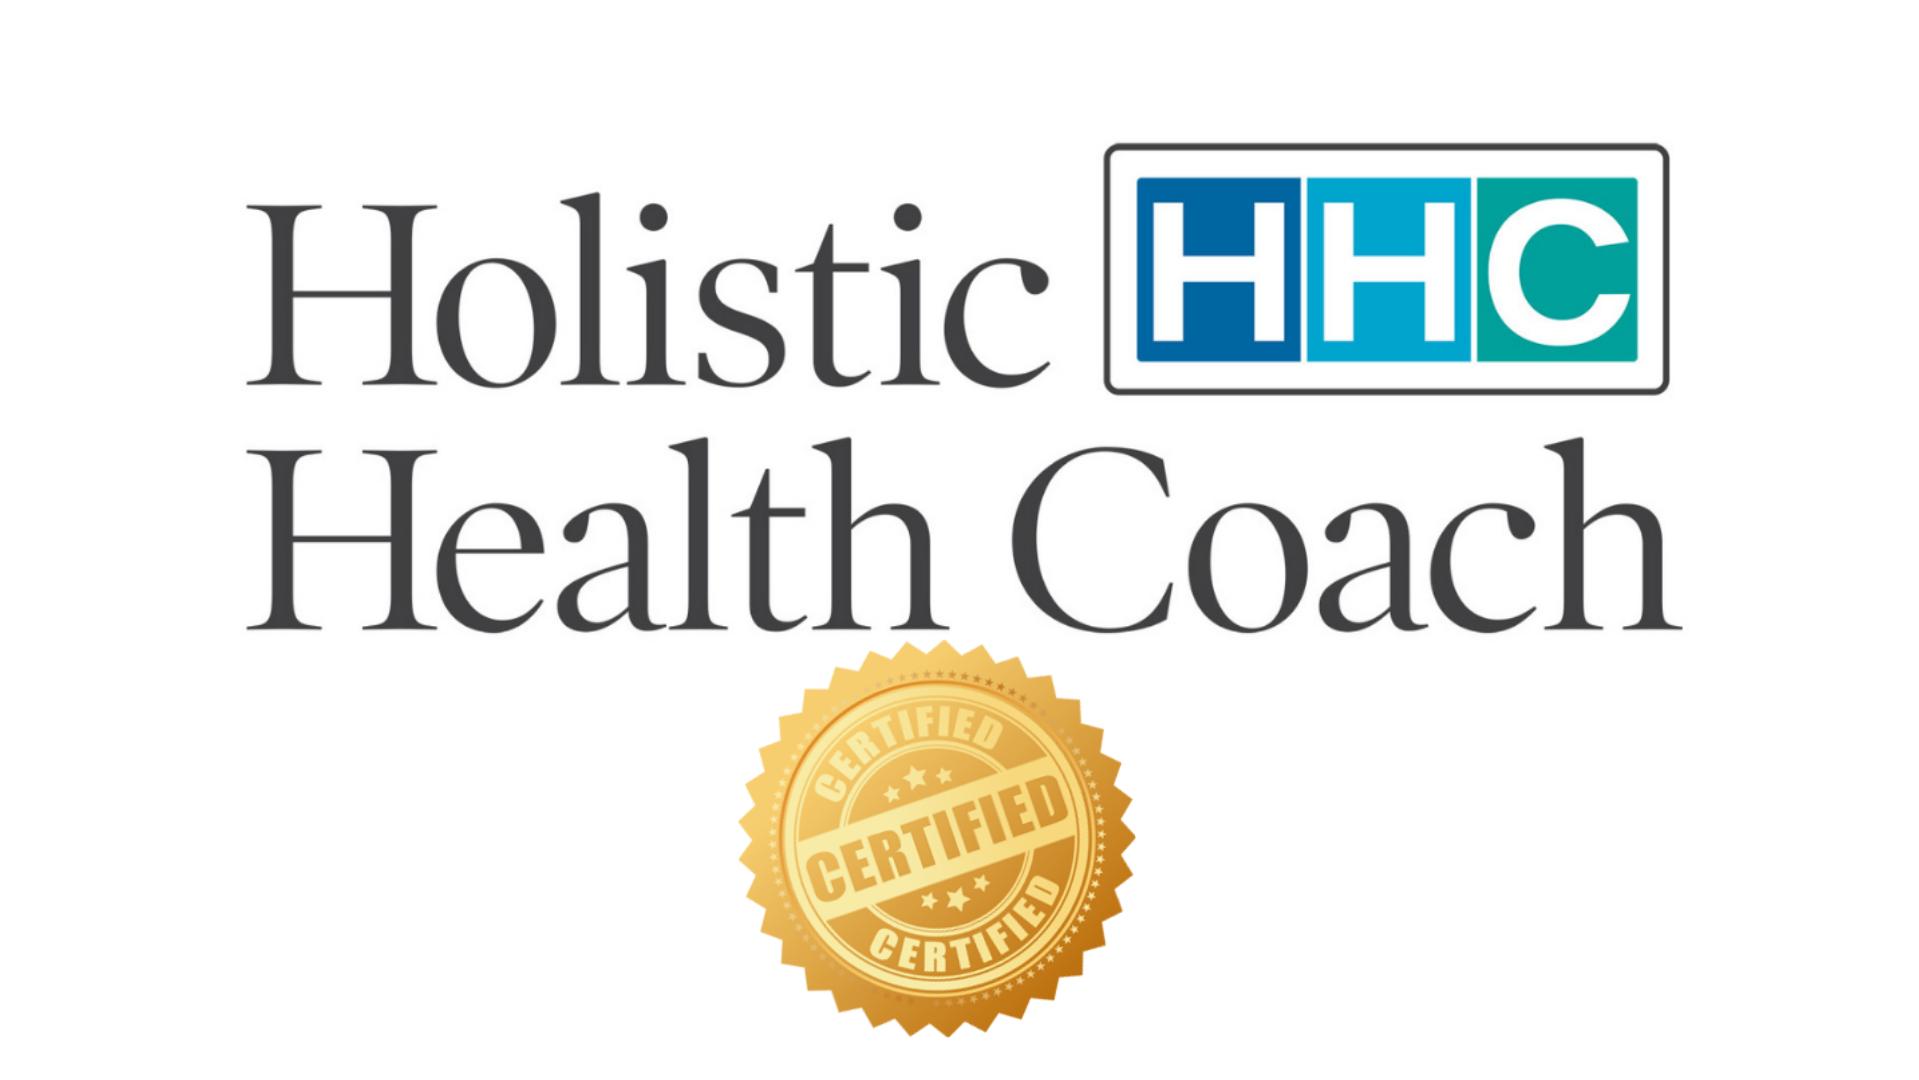 holistic certification, holistic coaching, health certification, holistic health education